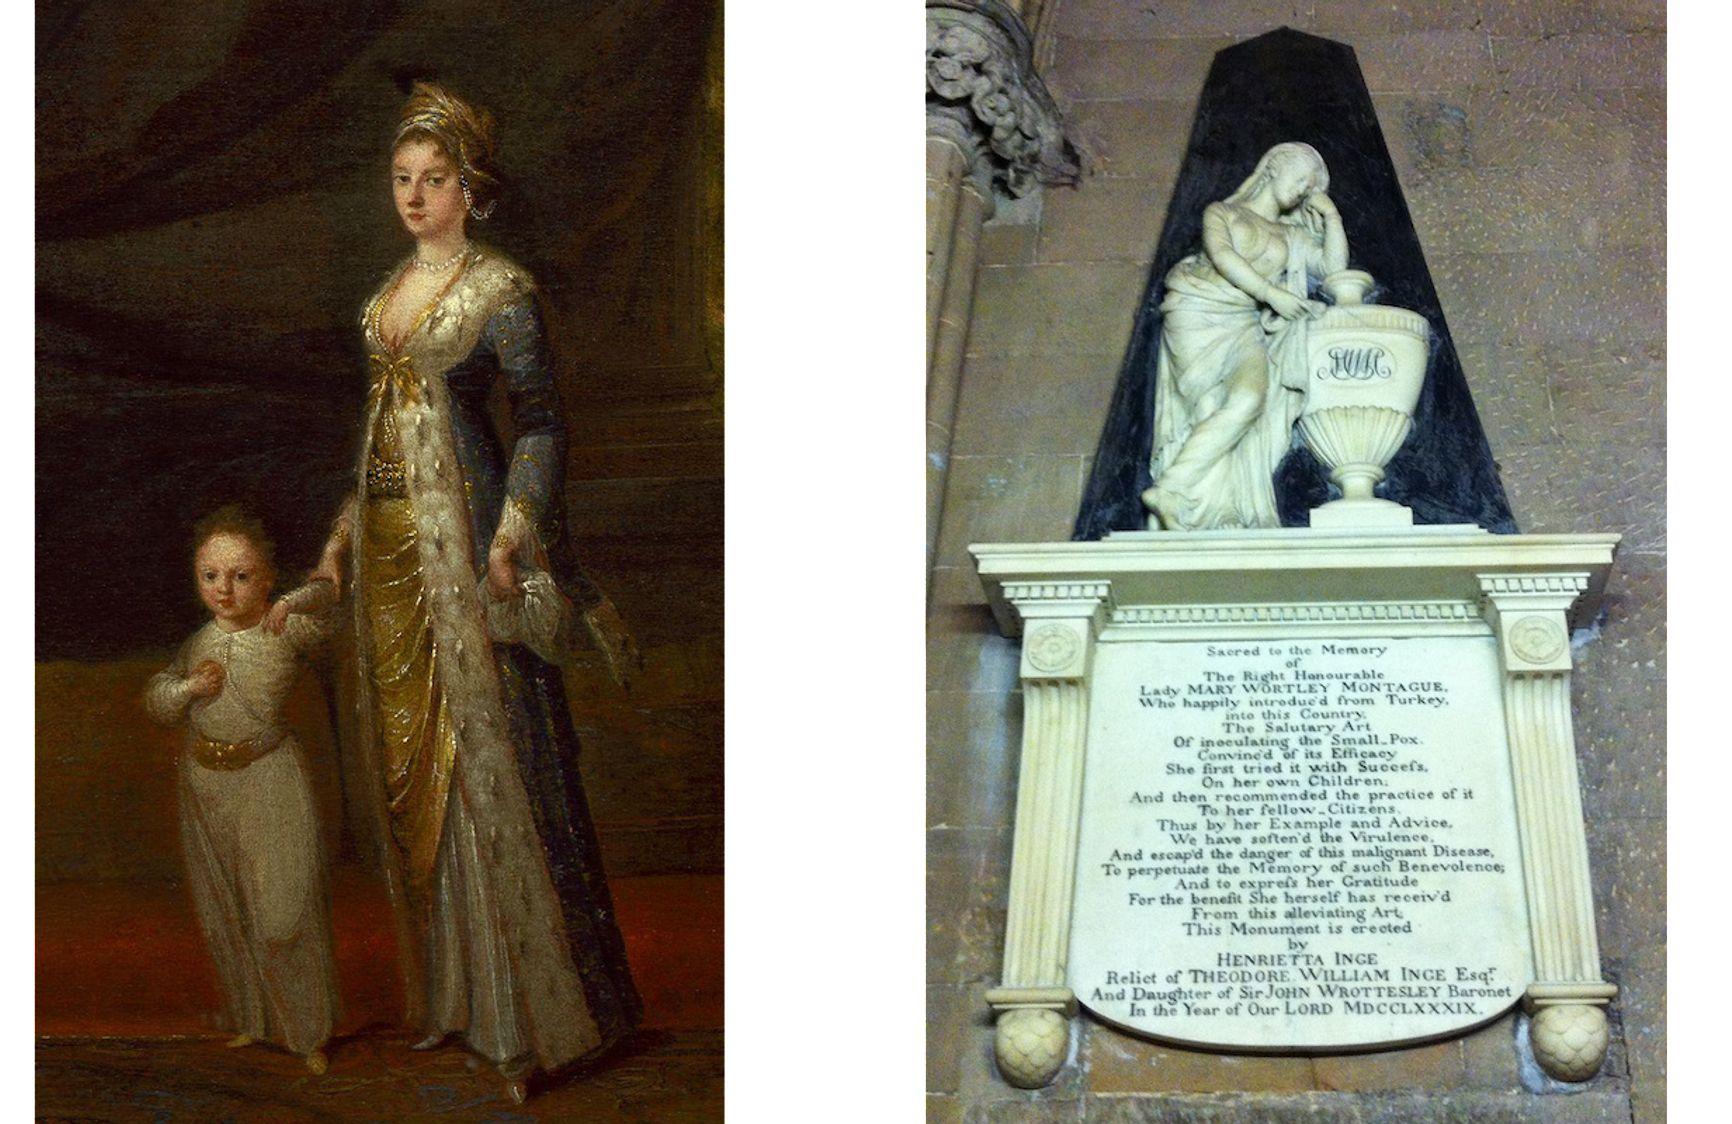 Леди Мэри Монтегю со своим сыном Эдвардом и мемориал Мэри Уортли Монтегю в Личфилде